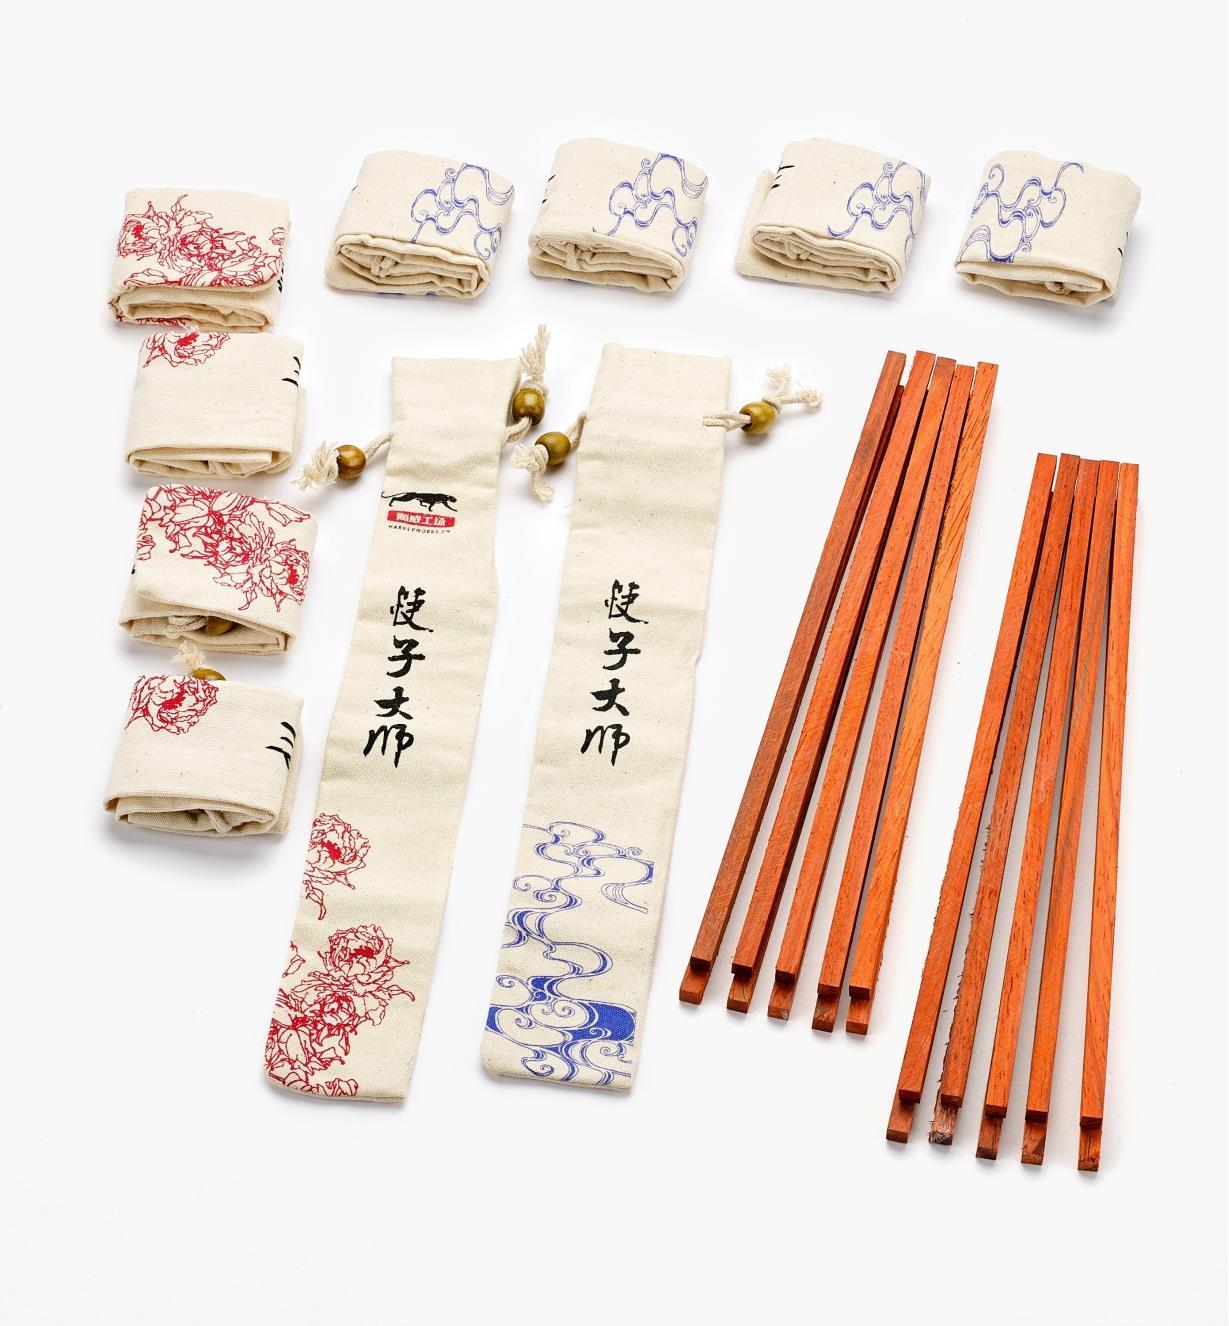 17N1609 - 10pr Padauk Chopstick Blanks & Bags